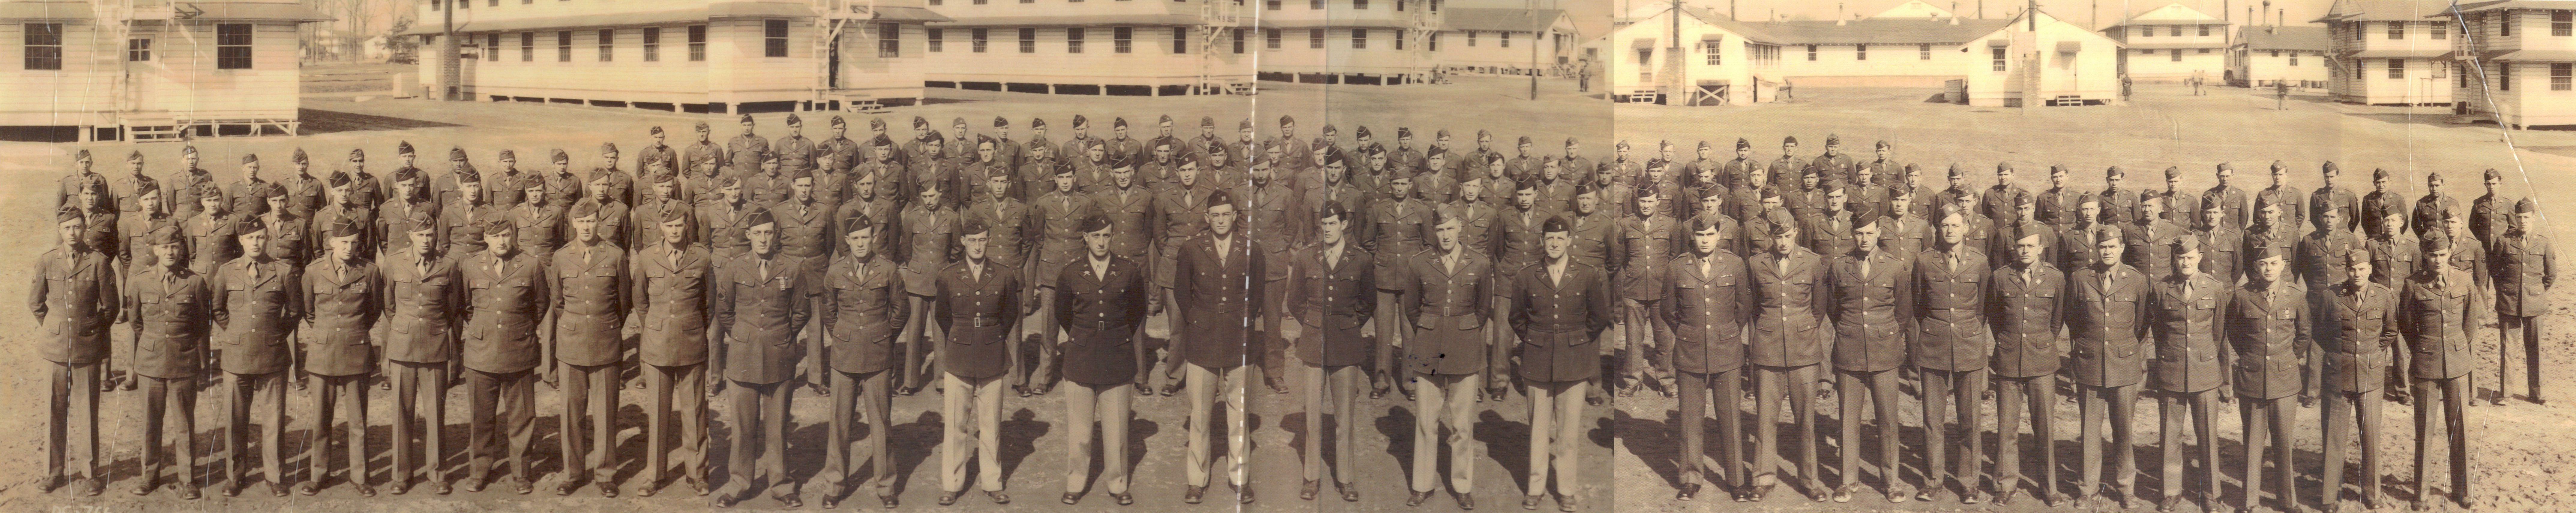 358th Infantry, 90th Div. preceding Normandy. Infantry